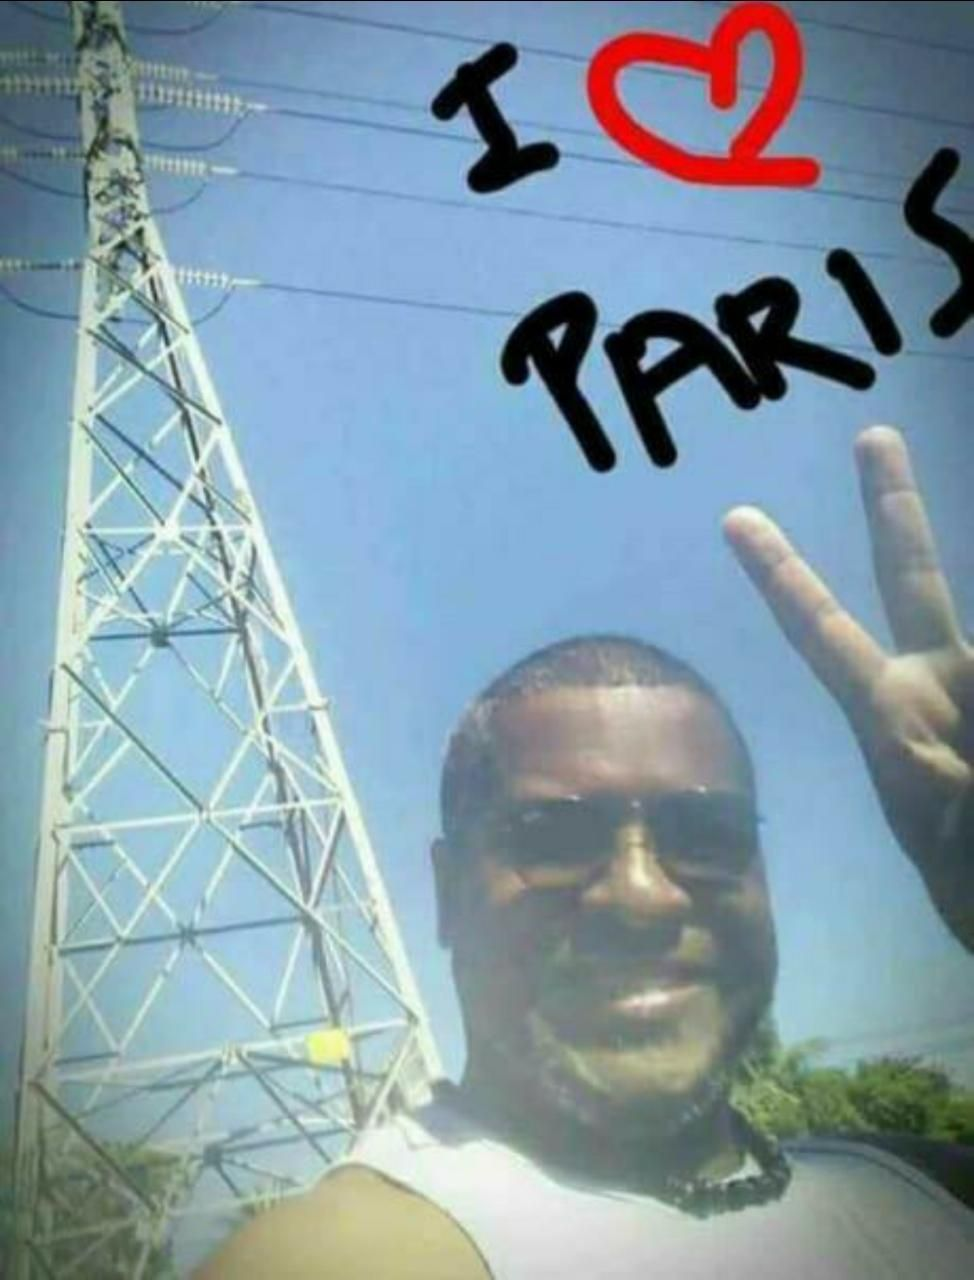 who was in Paris?